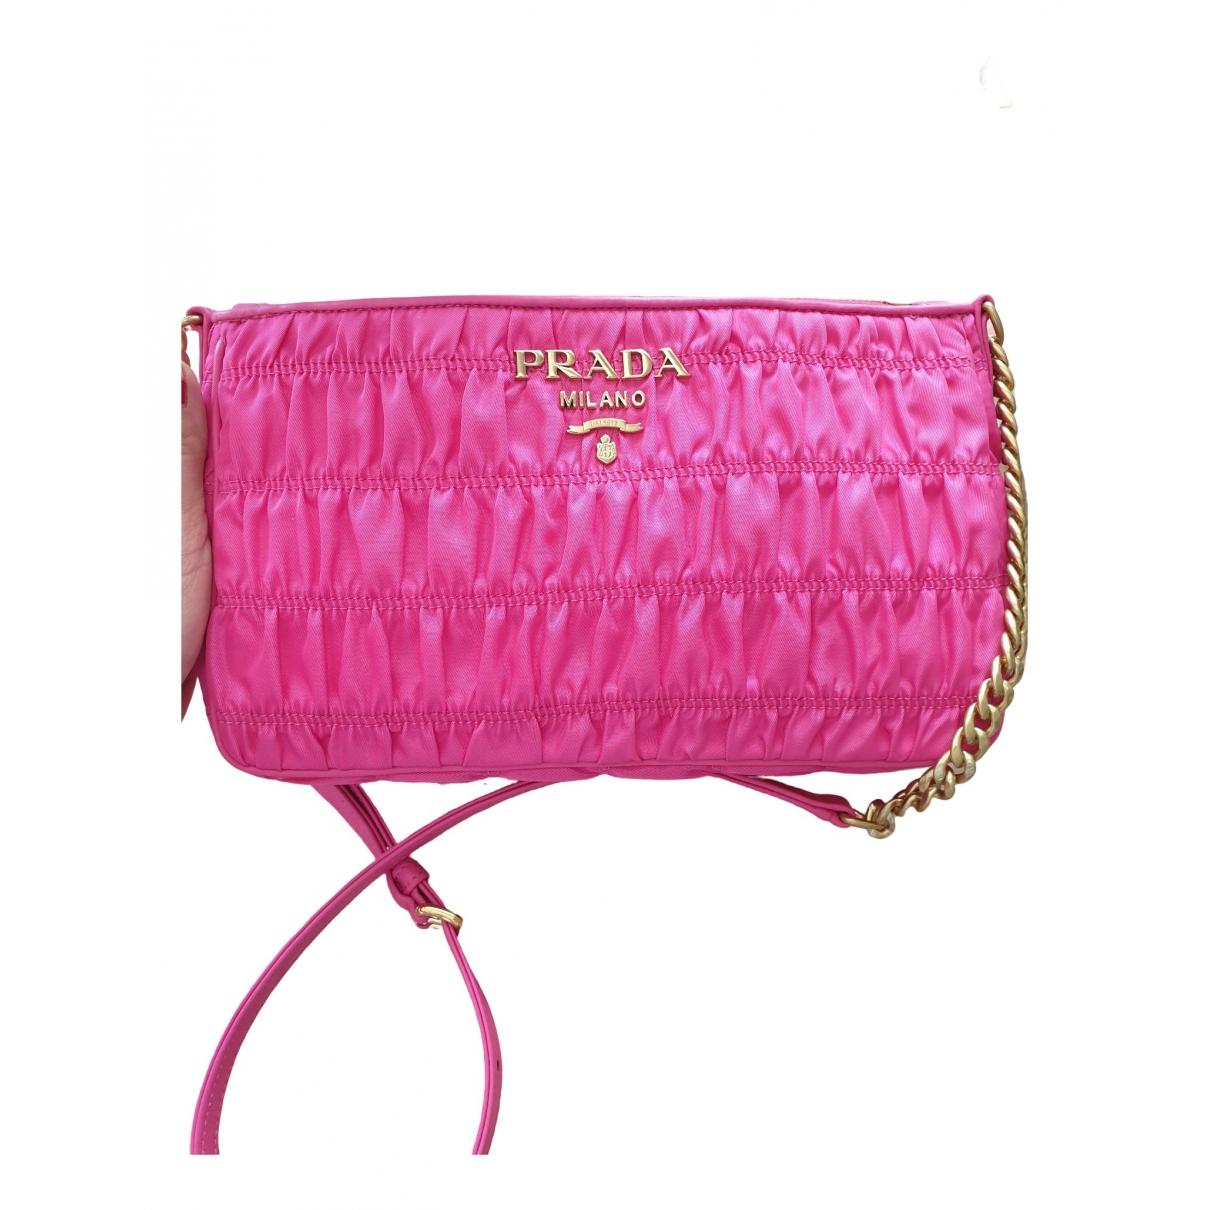 Prada \N Pink Cloth handbag for Women \N